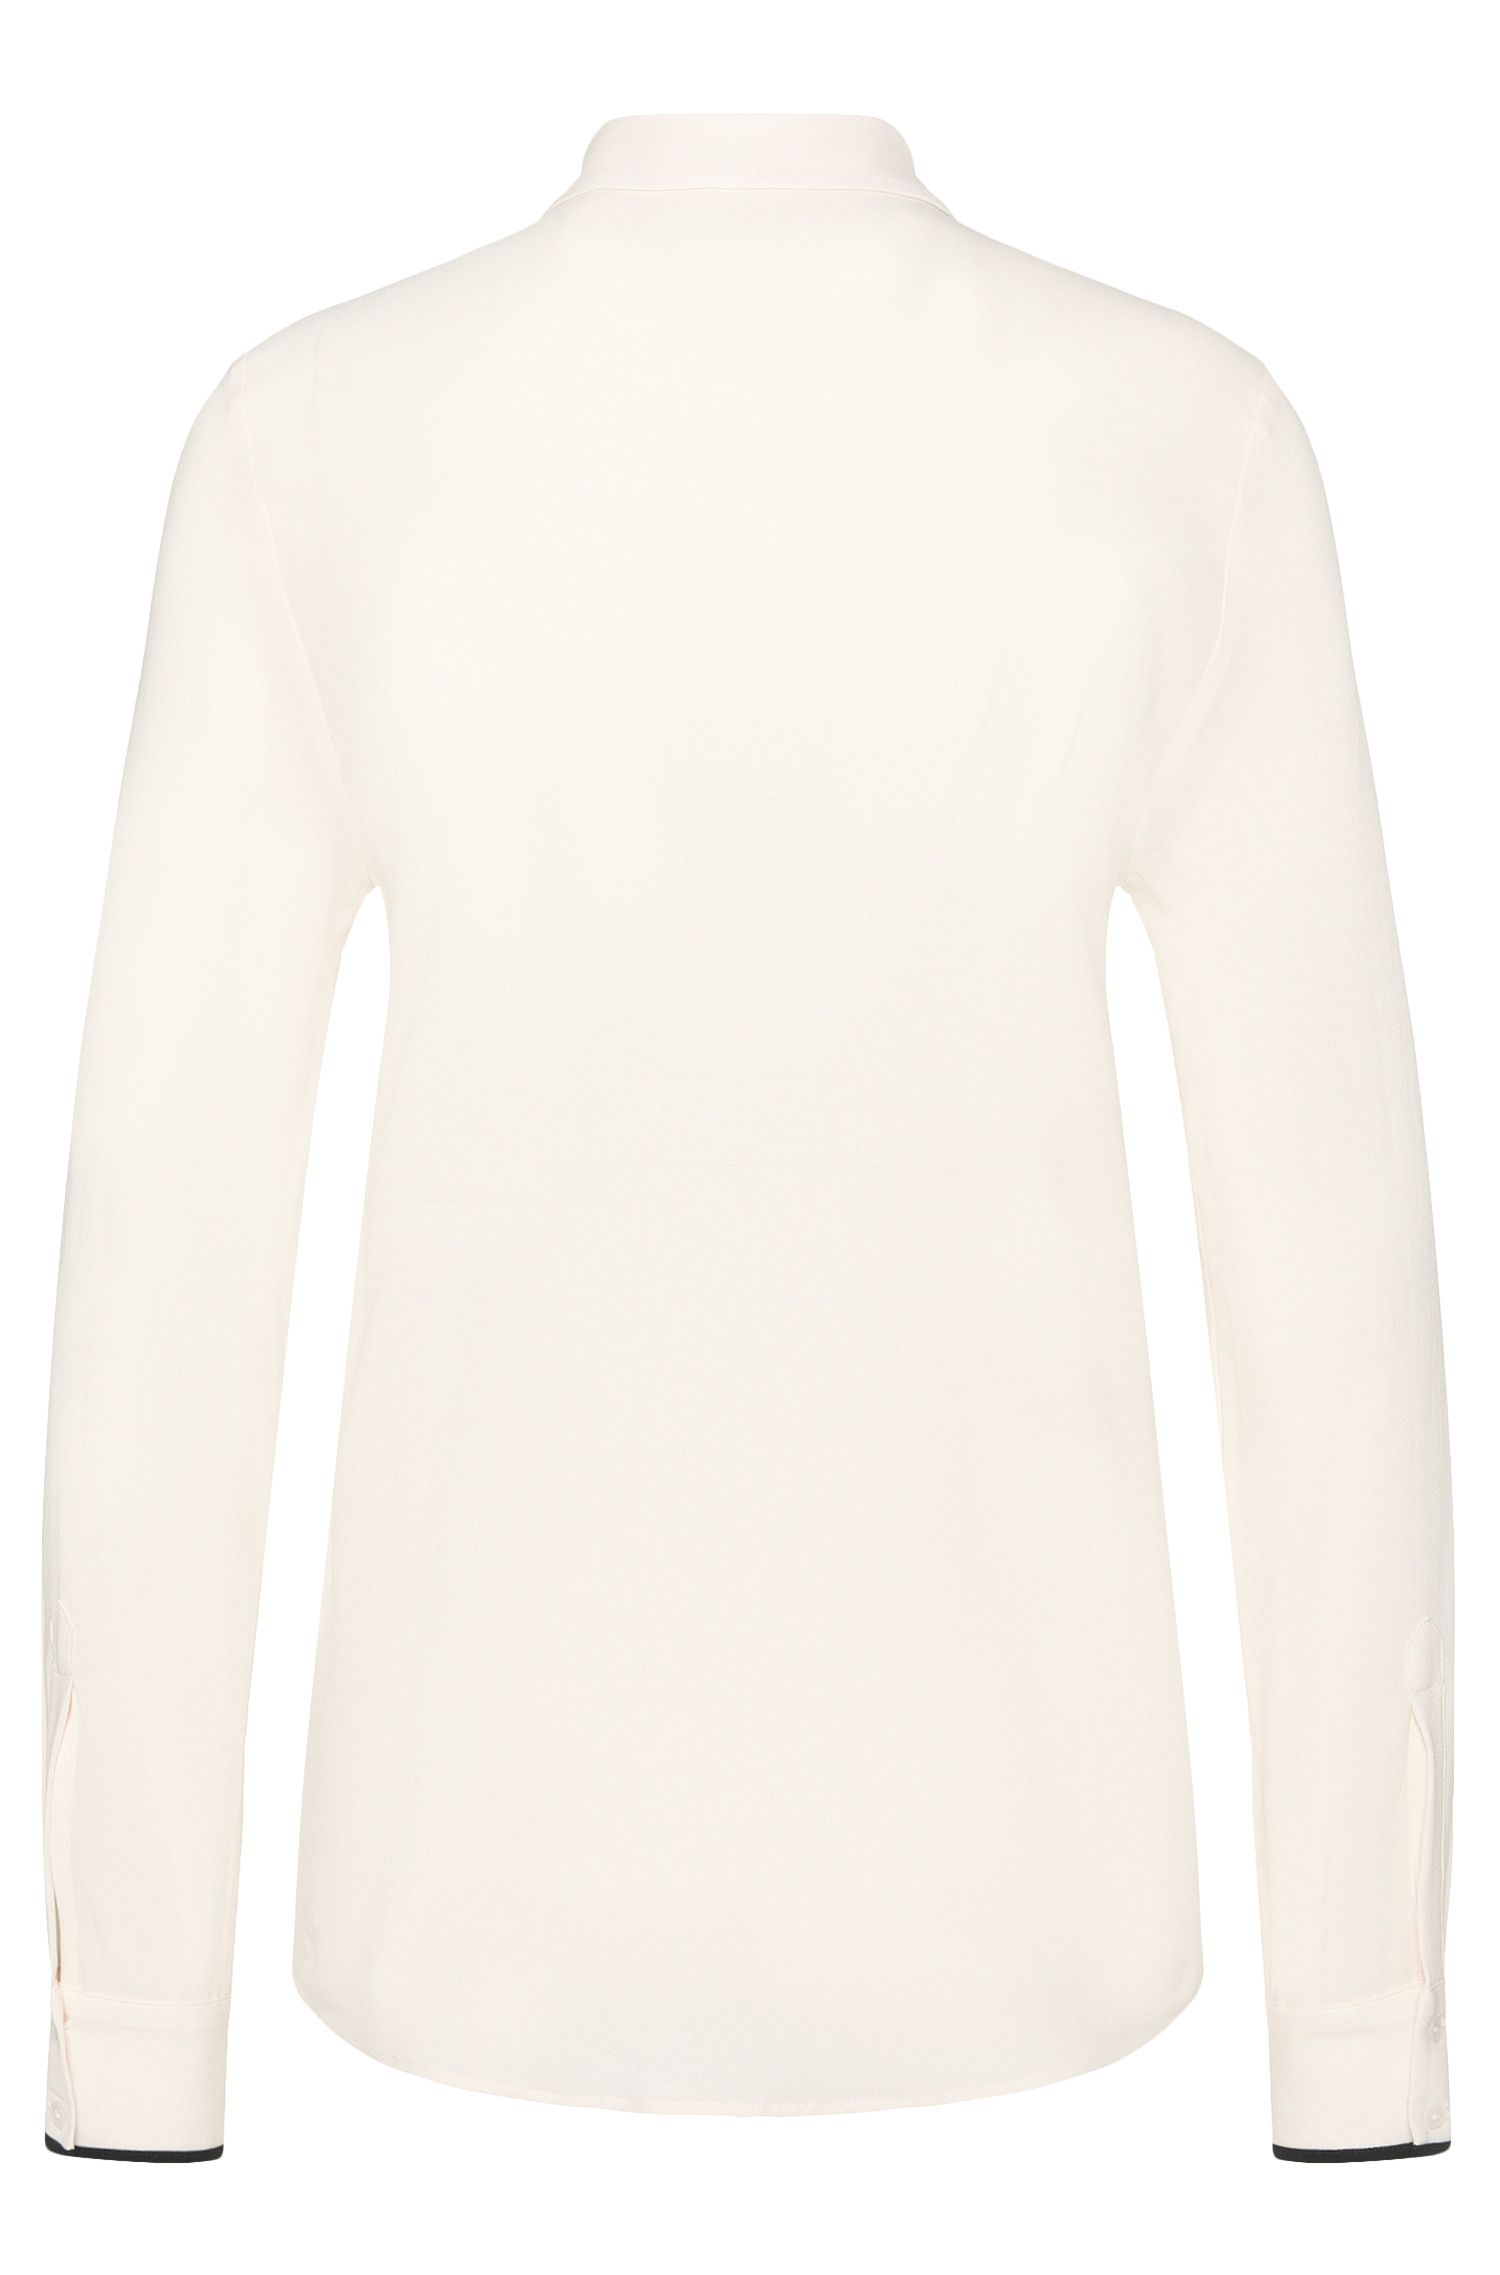 Bluse aus Stretch-Viskose mit kontrastiver Paspel: 'Efesiel'